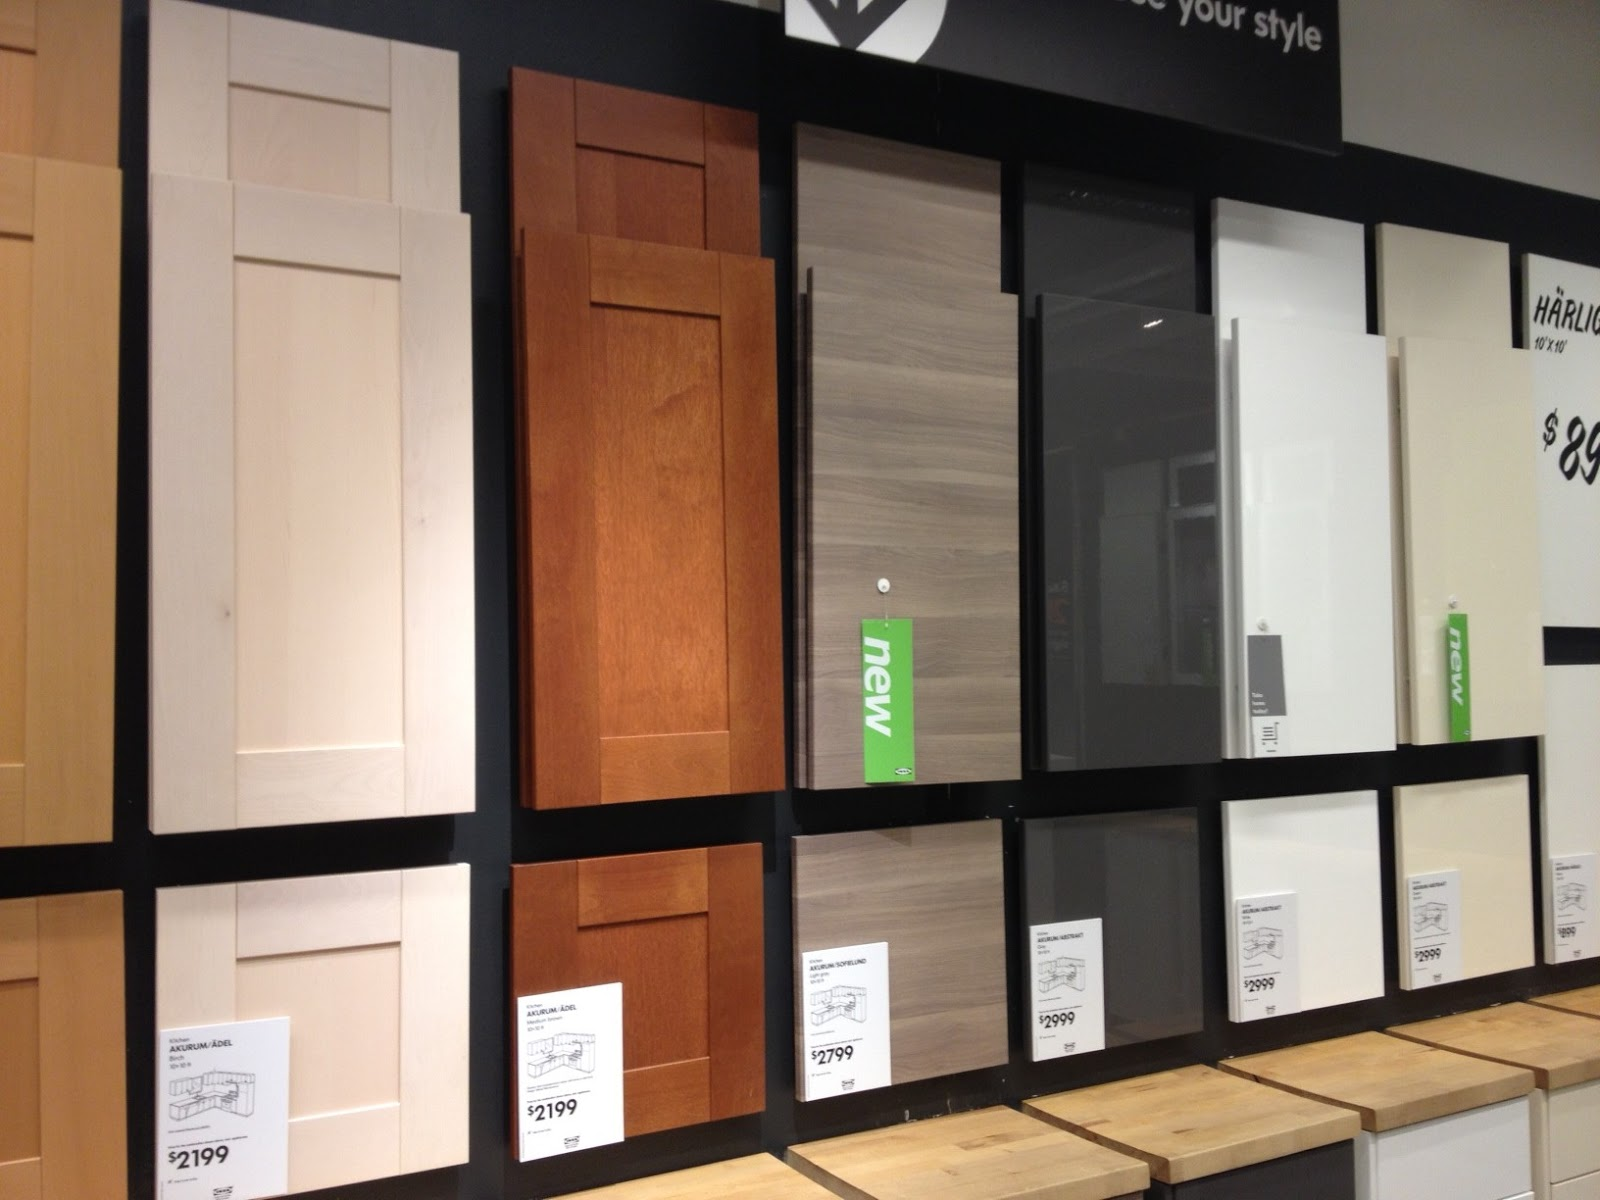 ikea kitchen cabinets door lineup kitchen cabinet door styles IKEA Kitchen Cabinets the Door lineup